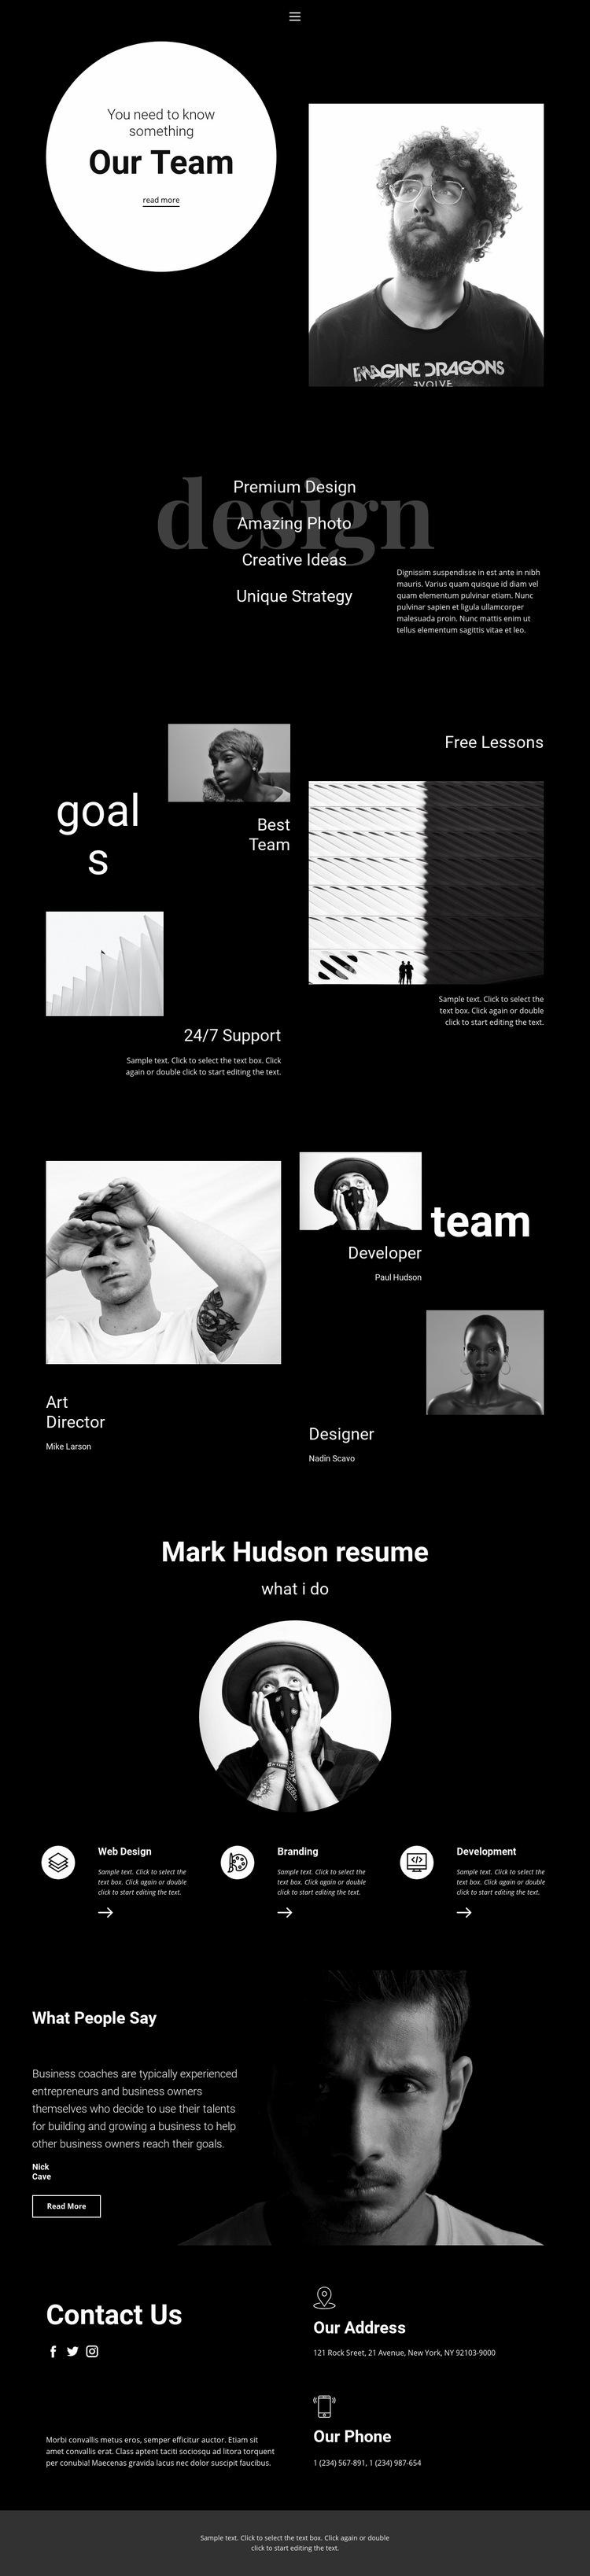 Design and development team Html Code Example